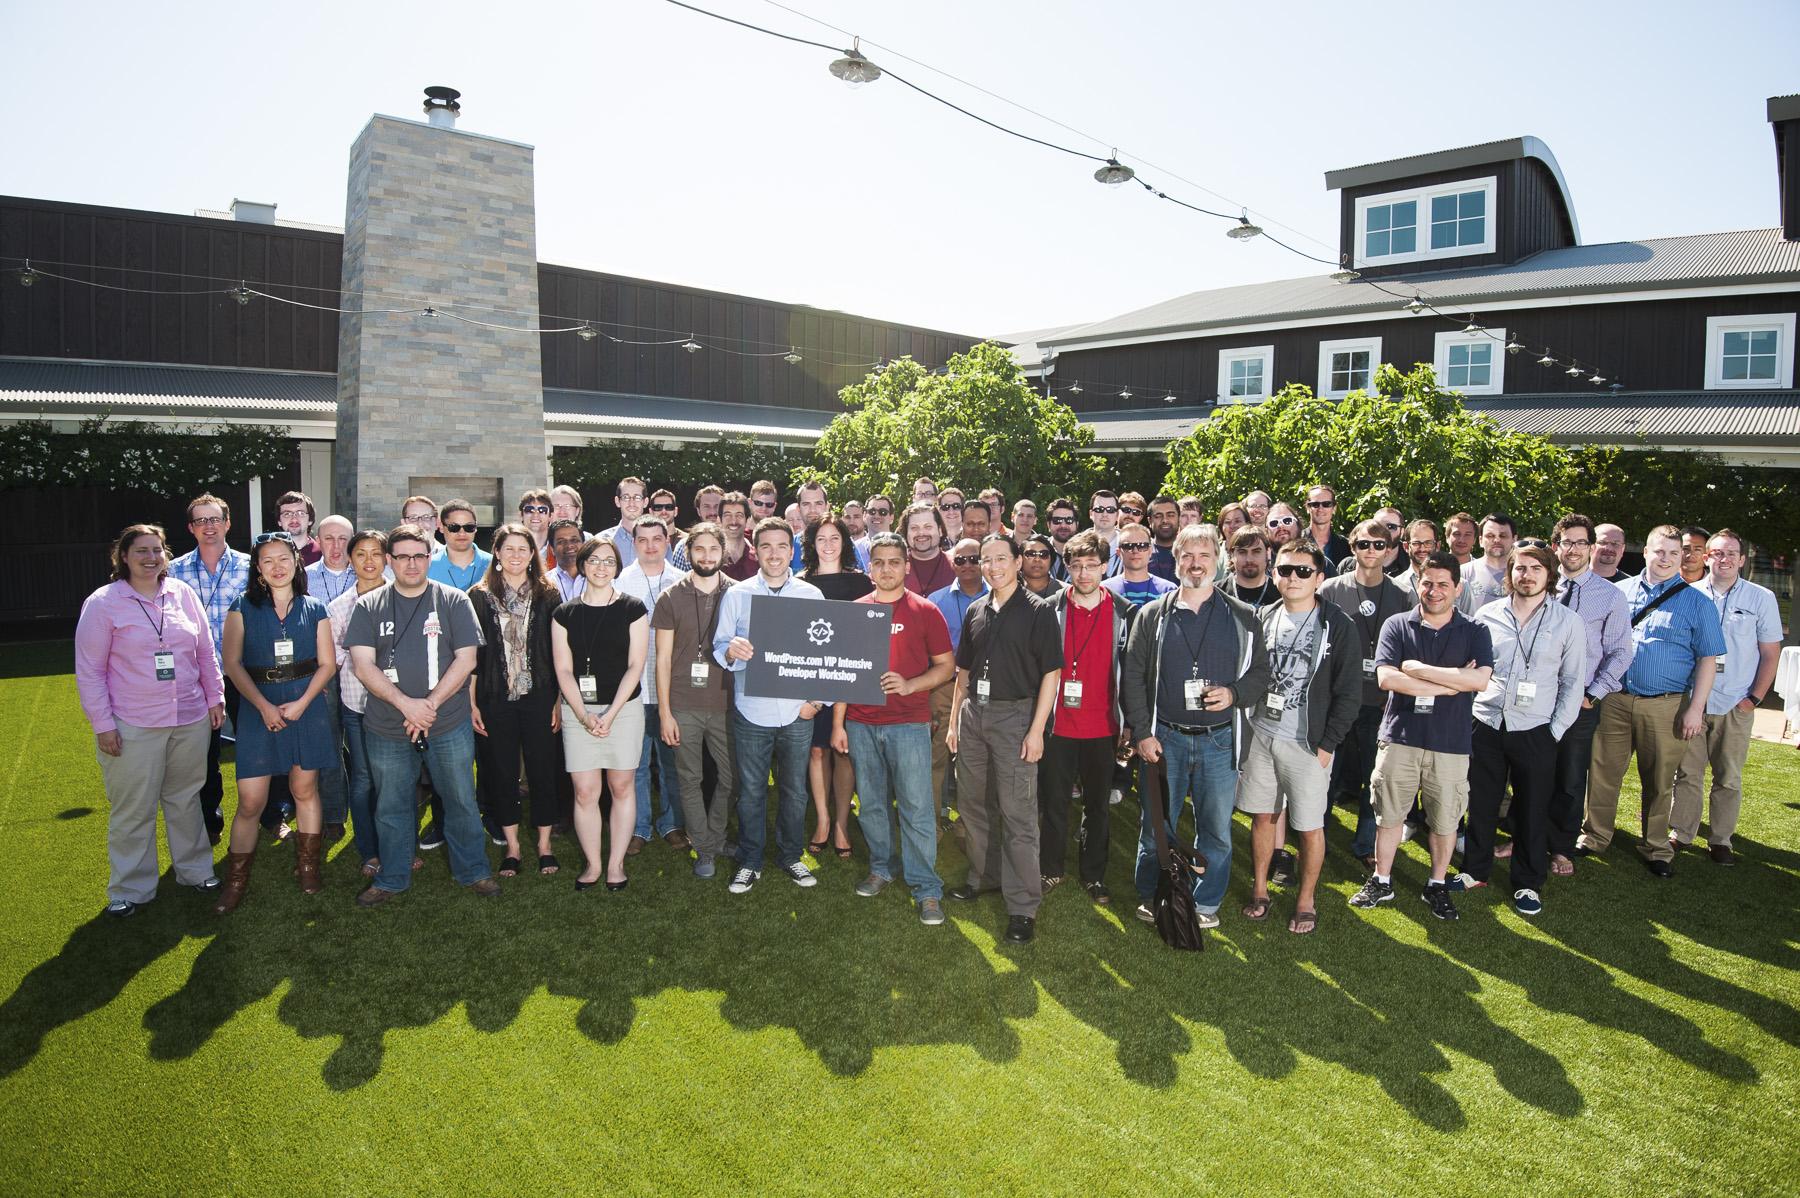 WordPress.com VIP Workshop 2013 Group photo